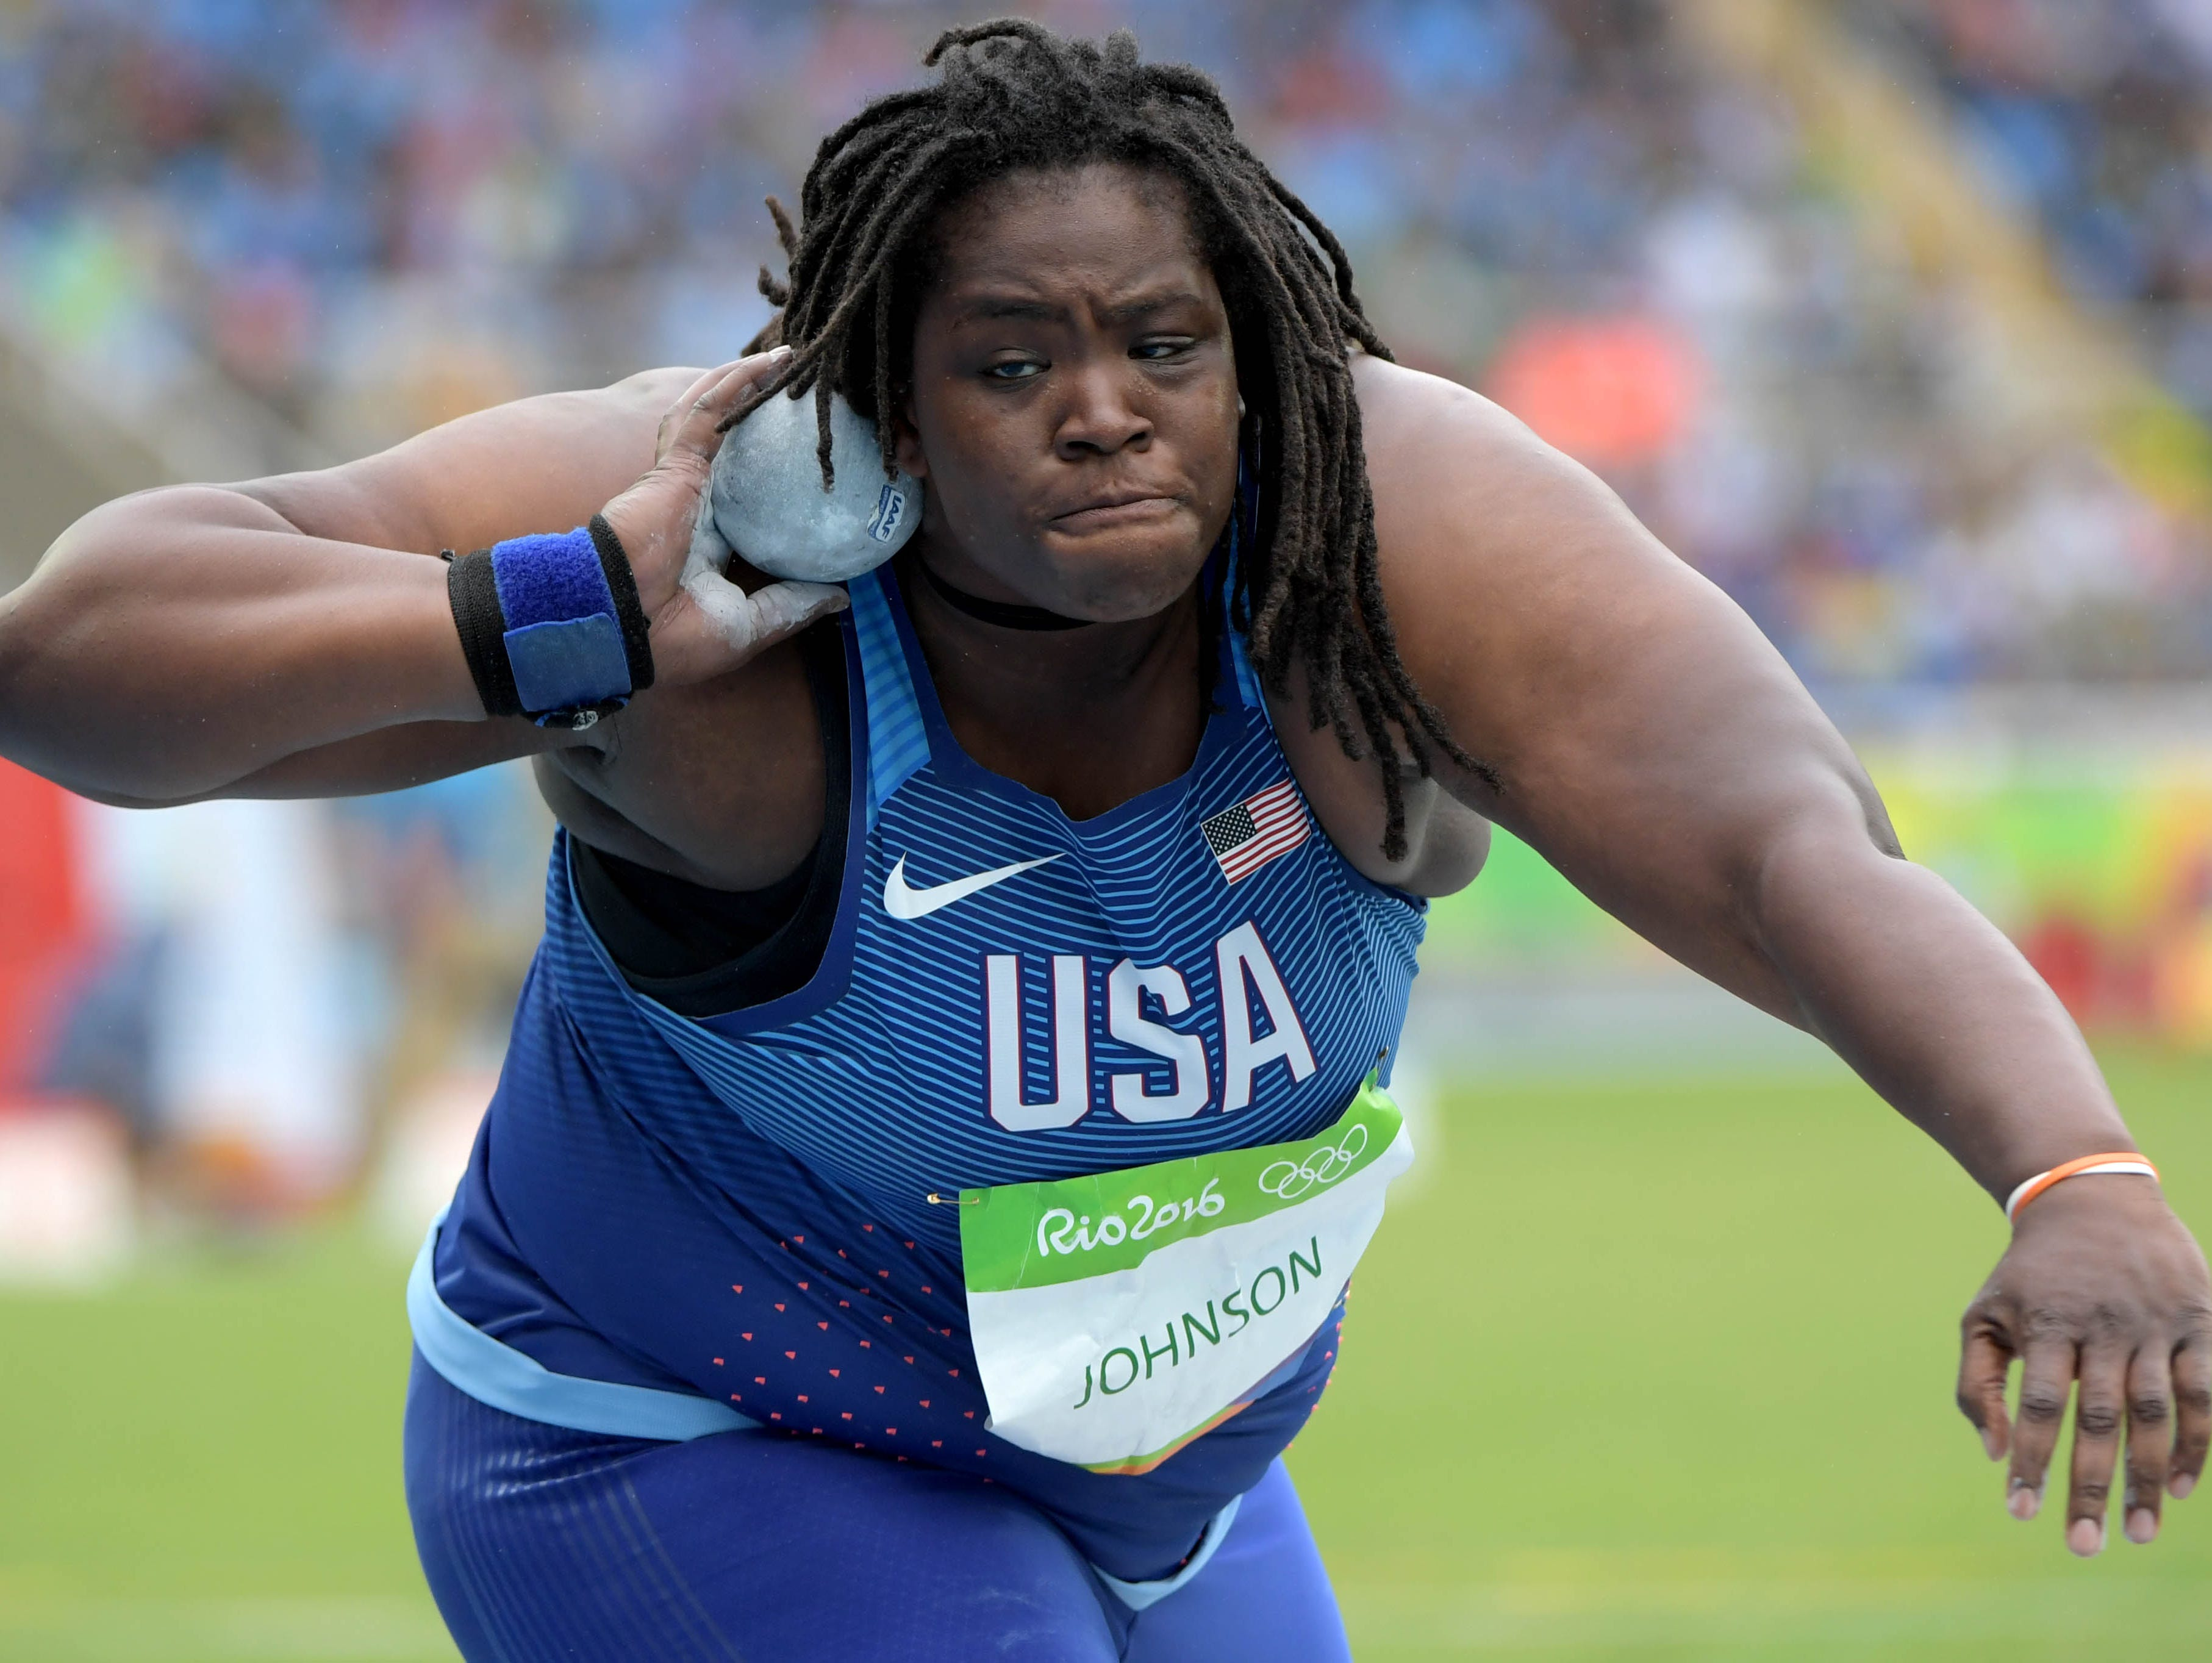 Felisha Johnson (USA) competes in the women's shot put event at Estadio Olimpico Joao Havelange in the Rio 2016 Summer Olympic Games.